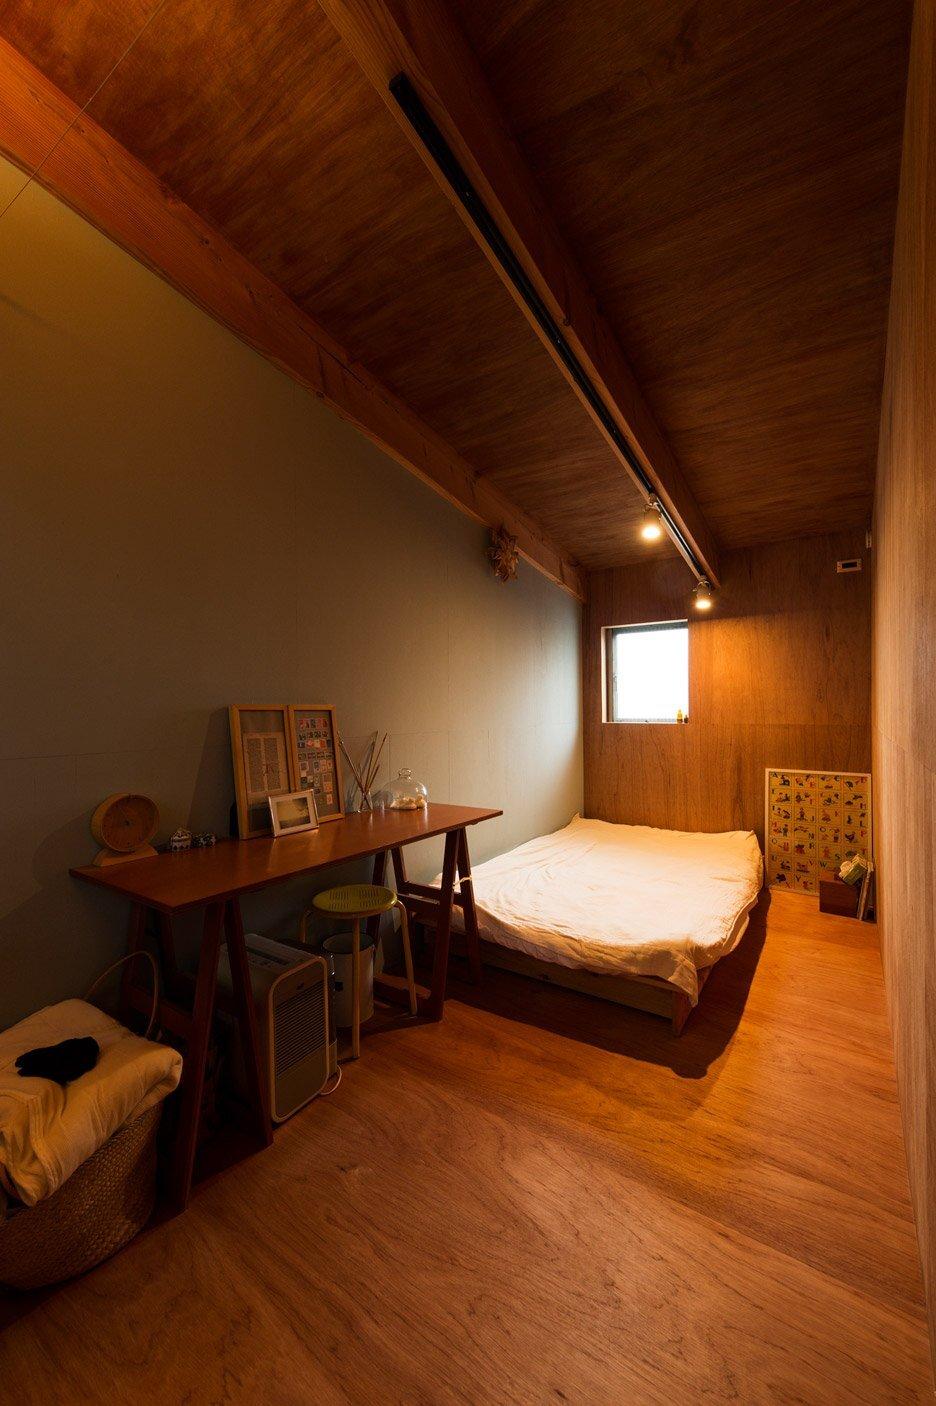 House to Catch a Tree - Takeru Shoji Architects - Japan - Bedroom - Humble Homes